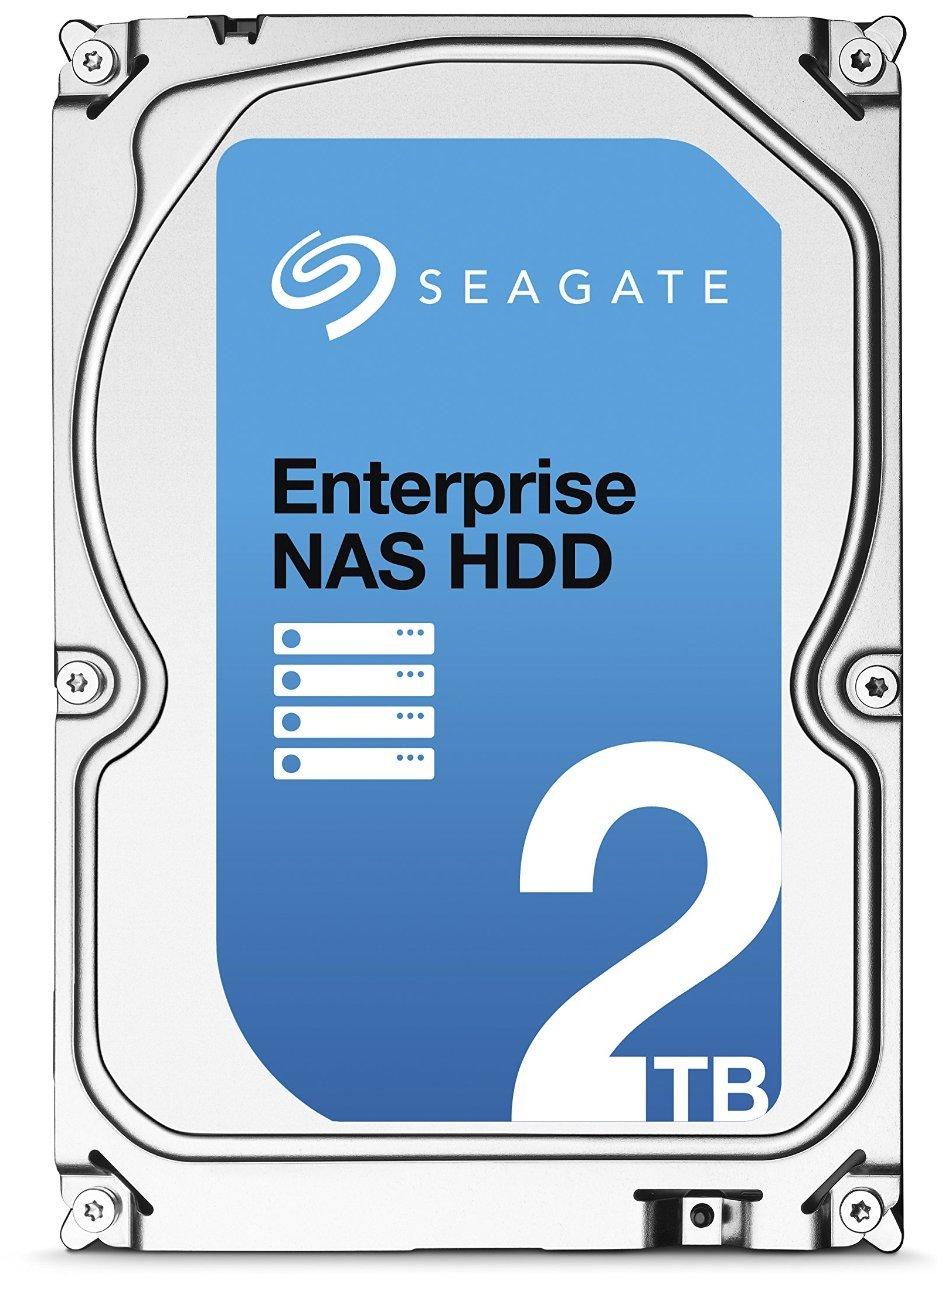 Pevný disk Seagate Enterprise NAS 2 TB Pevný disk, ST2000VN0001, SATA600, Interní 3,5, 7200RPM, 128MB cache ST2000VN0001